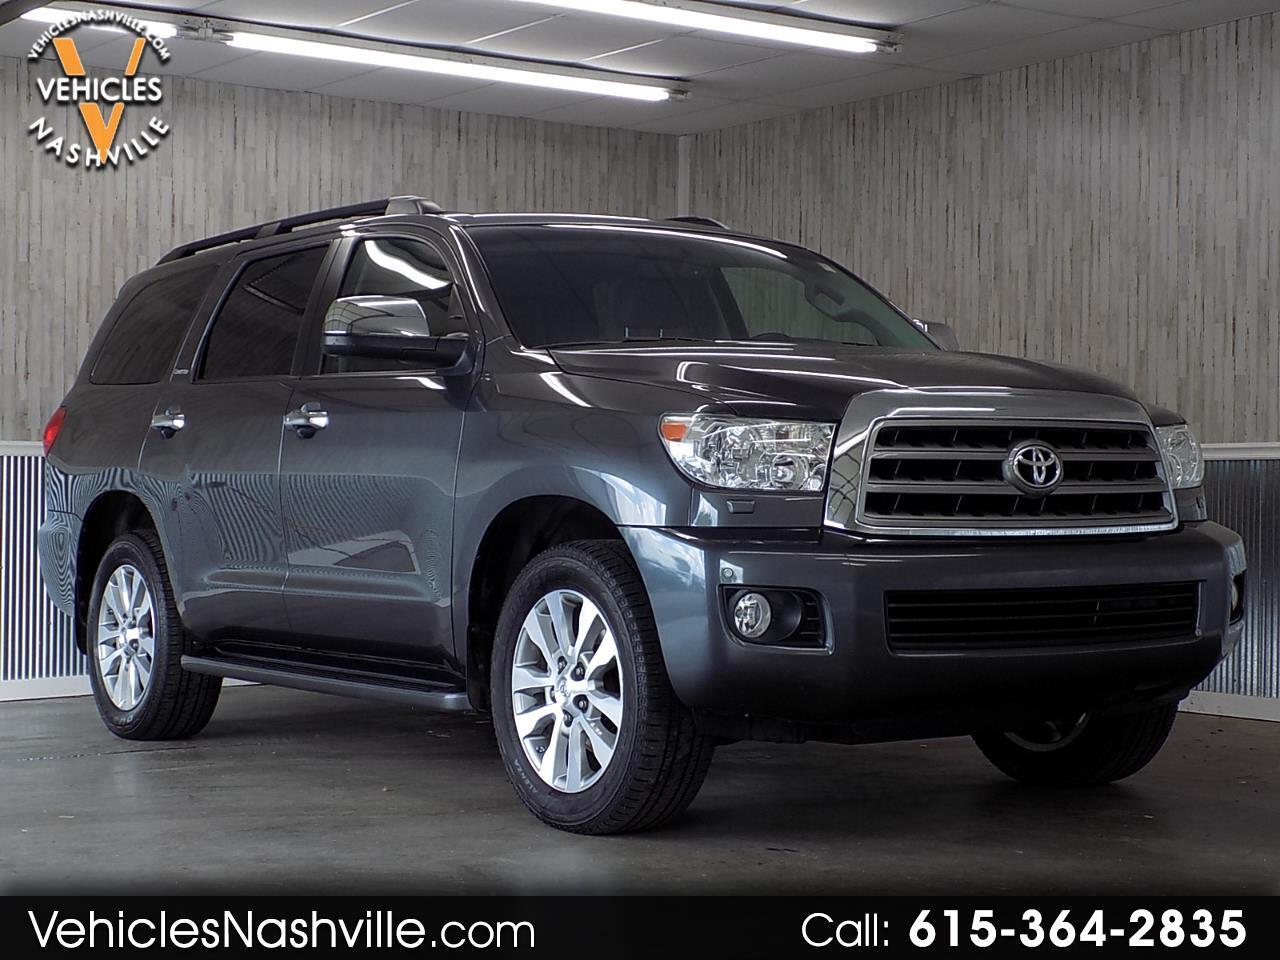 2015 Toyota Sequoia Limited 4WD FFV